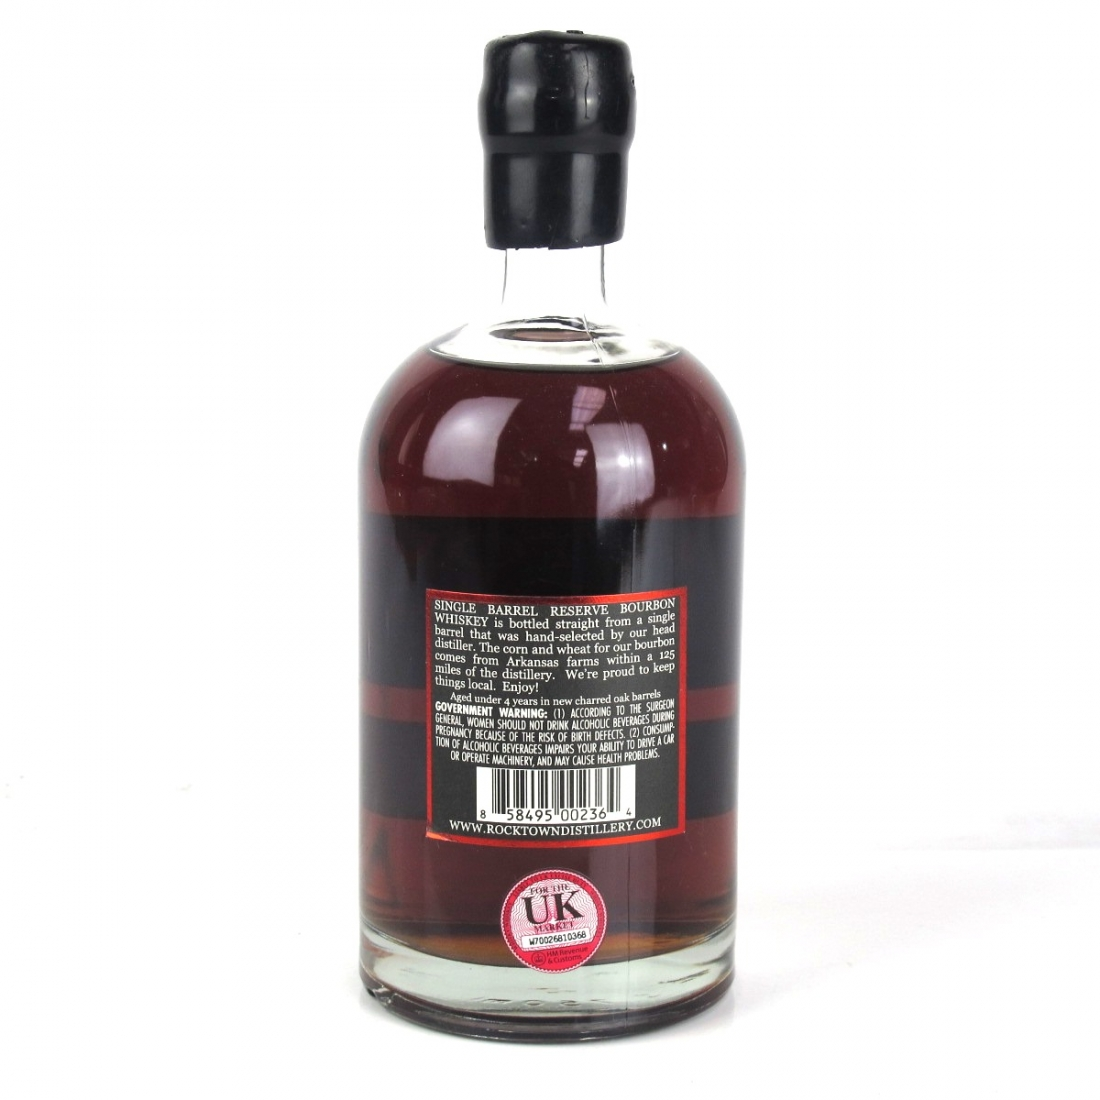 Rock Town Single Barrel Bourbon #190